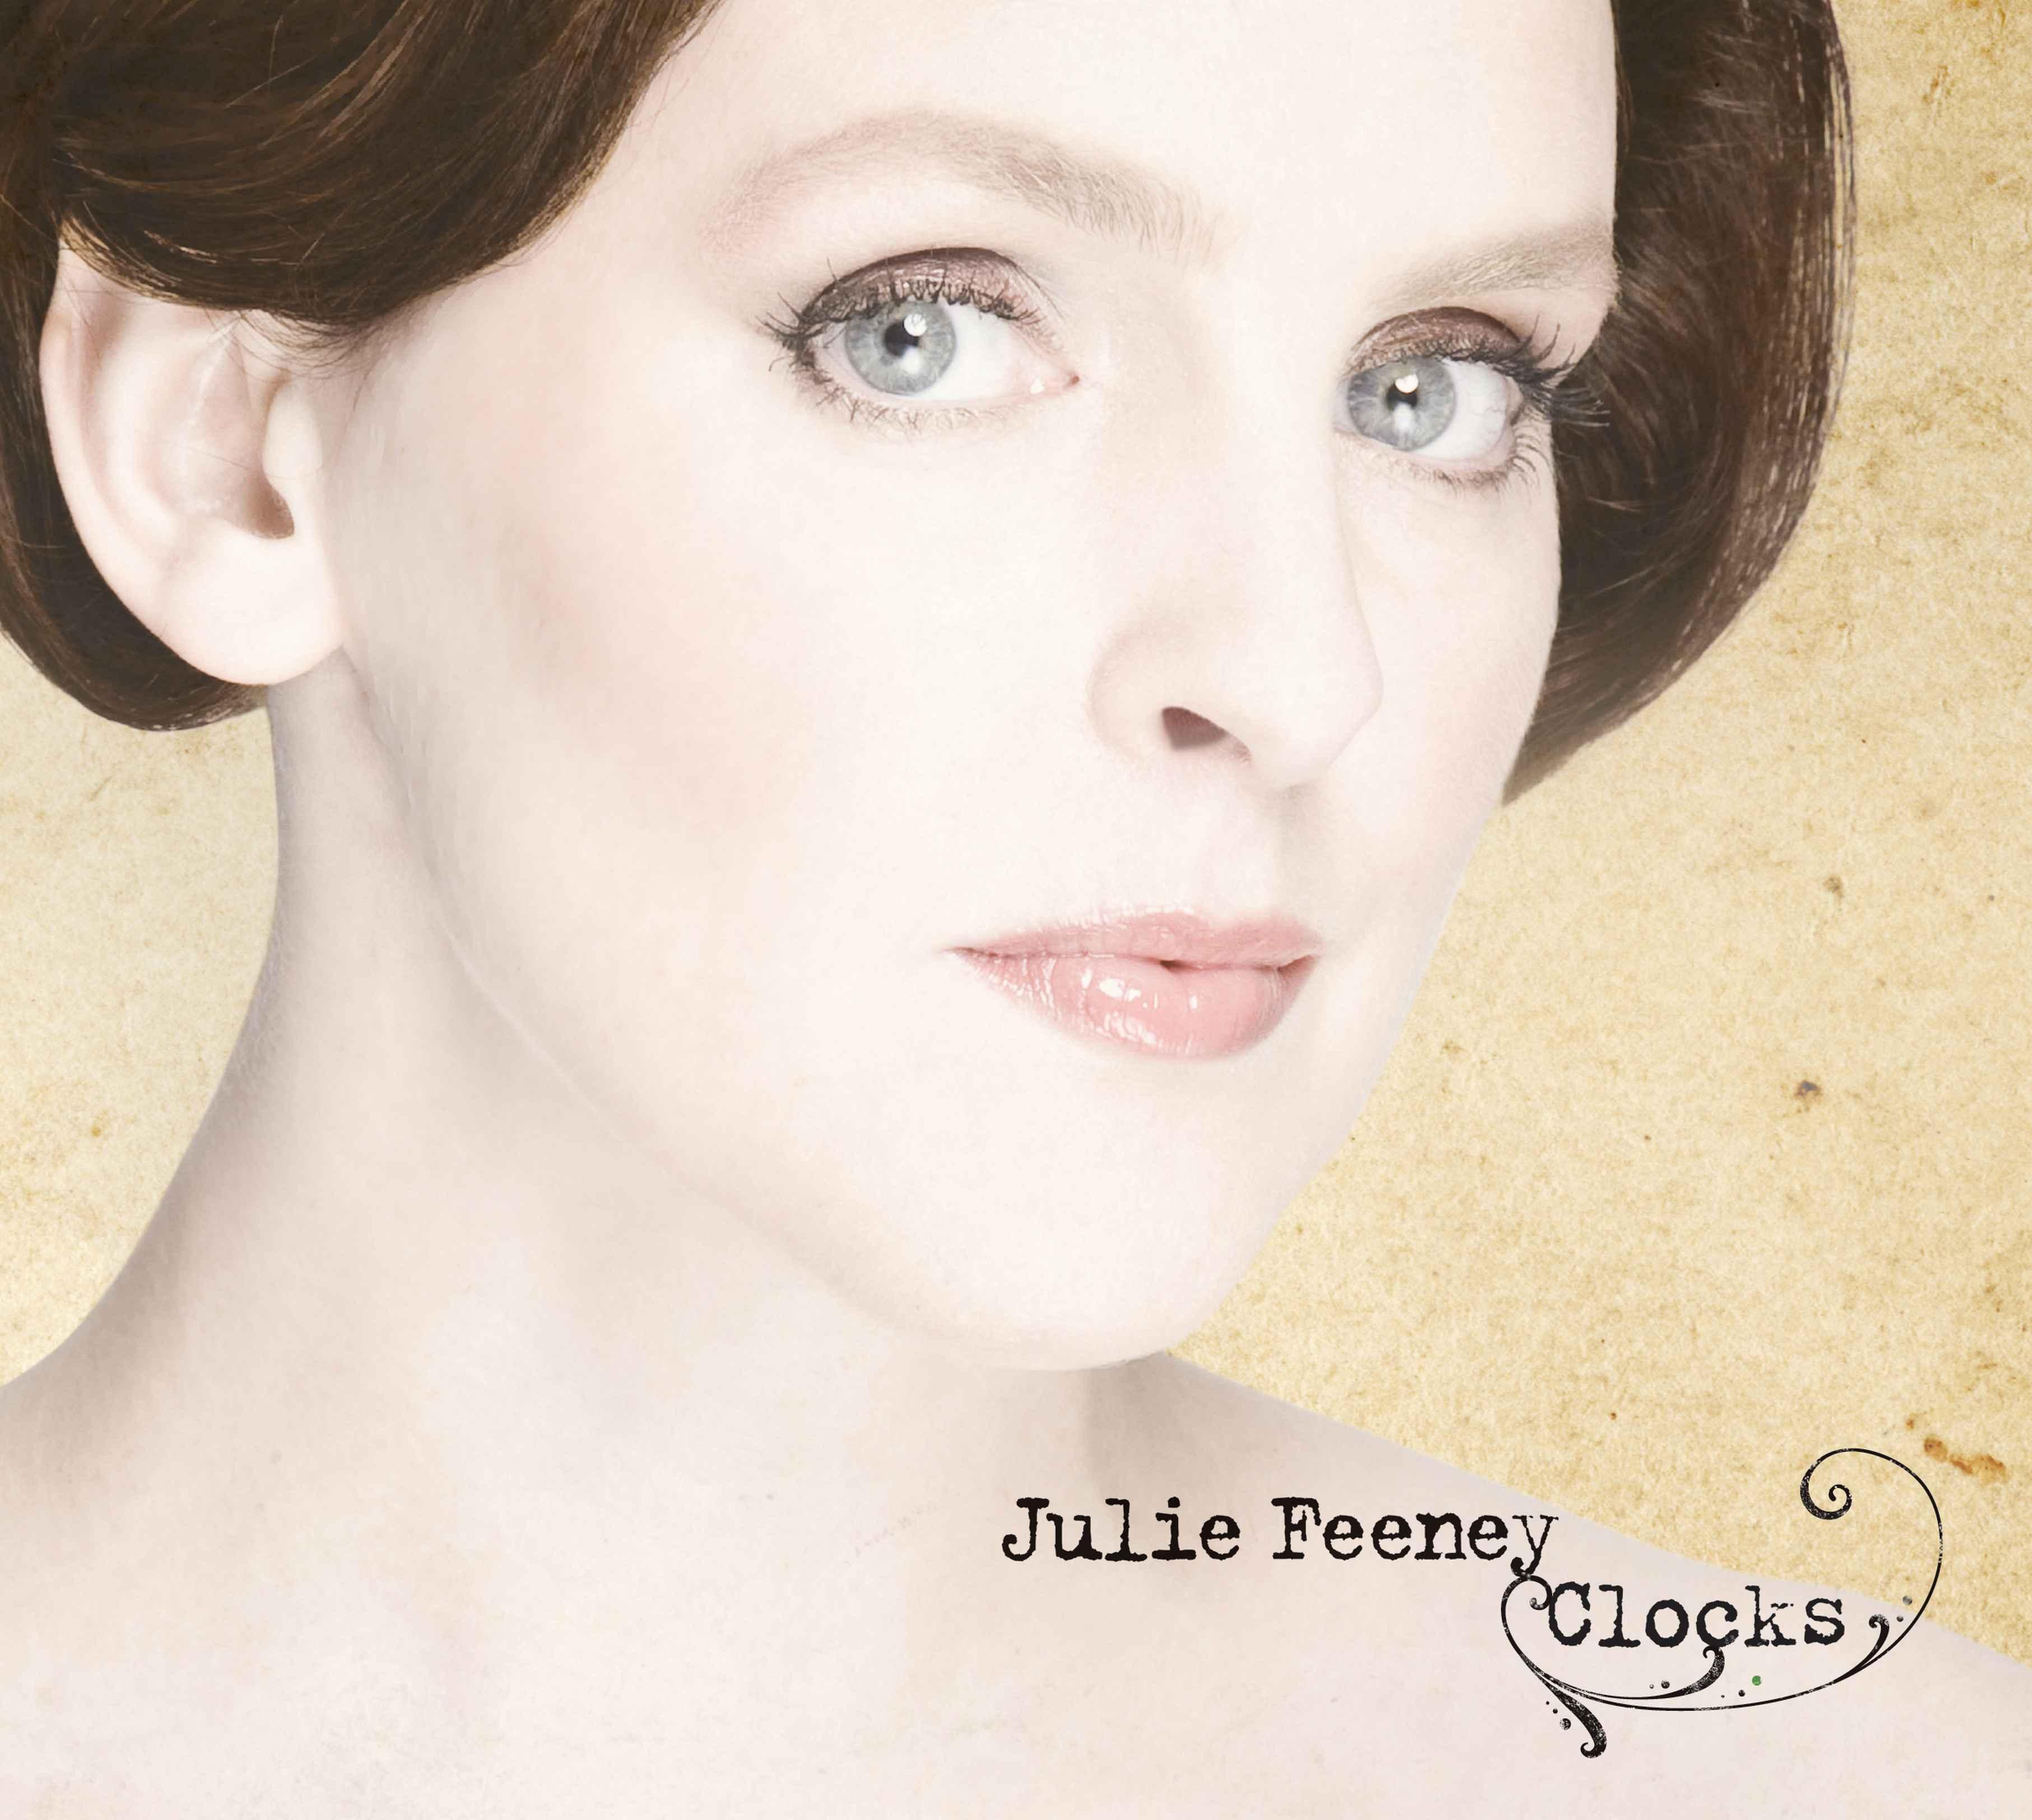 Julie Feeney Clocks Packshot1